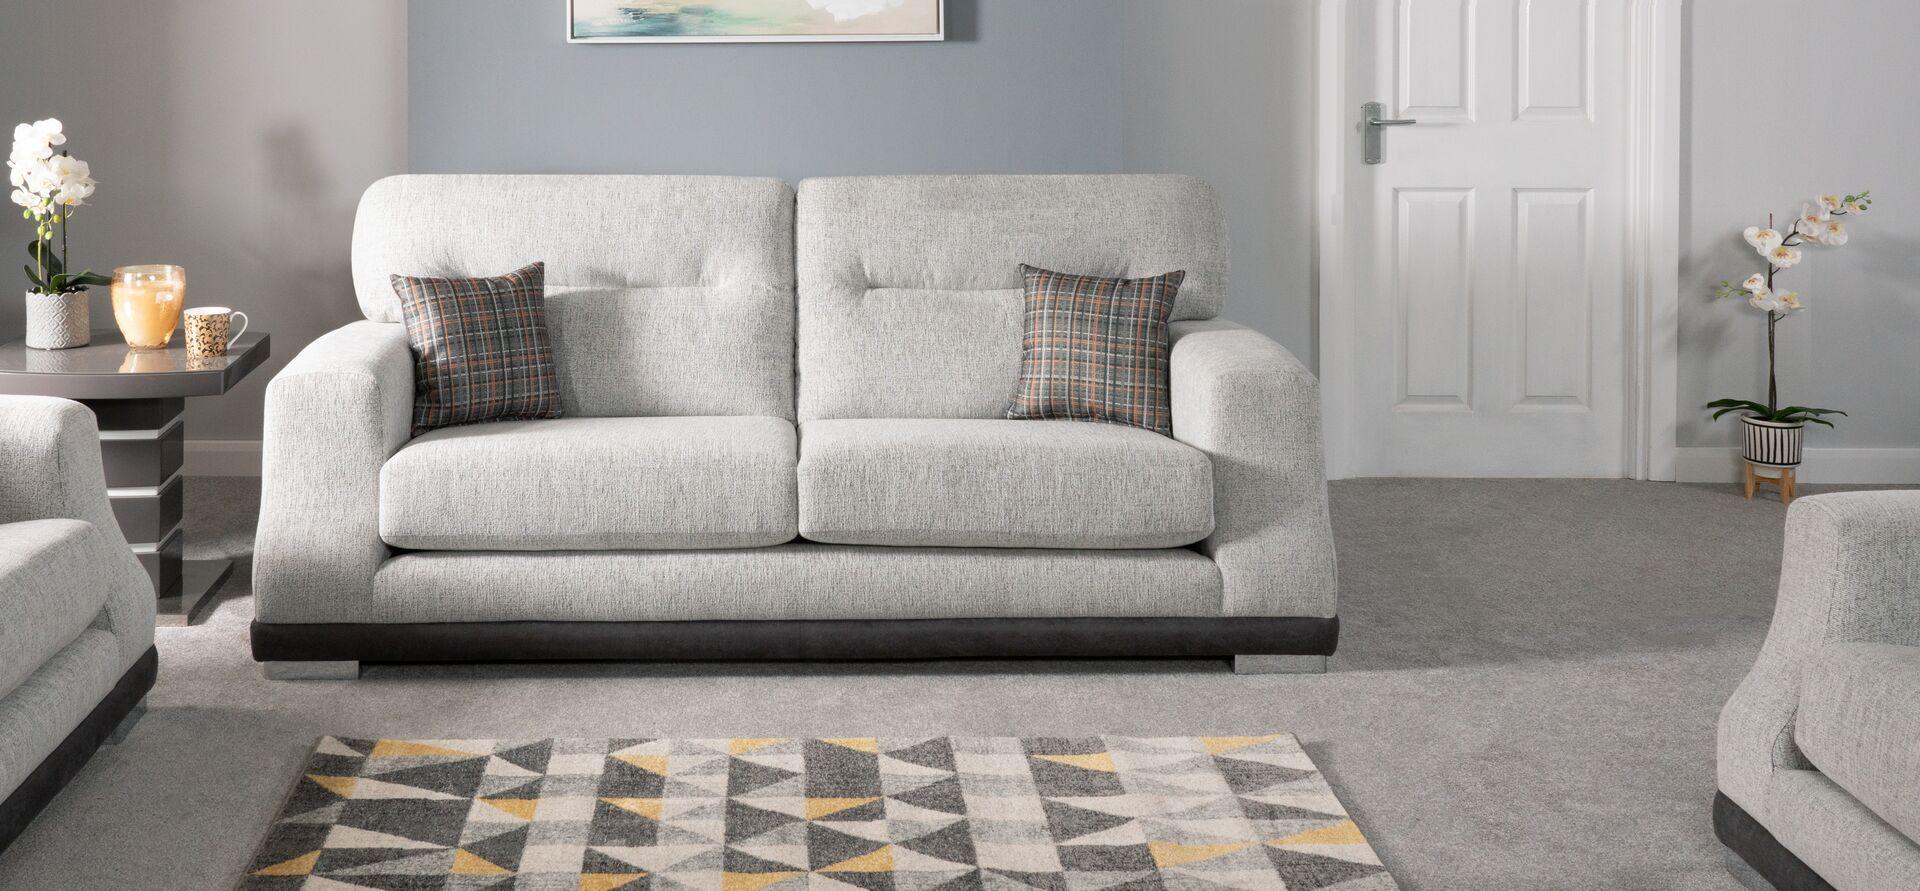 Delphi 3 Seater Sofa Standard Back Scs Seater Sofa 3 Seater Sofa Sofa